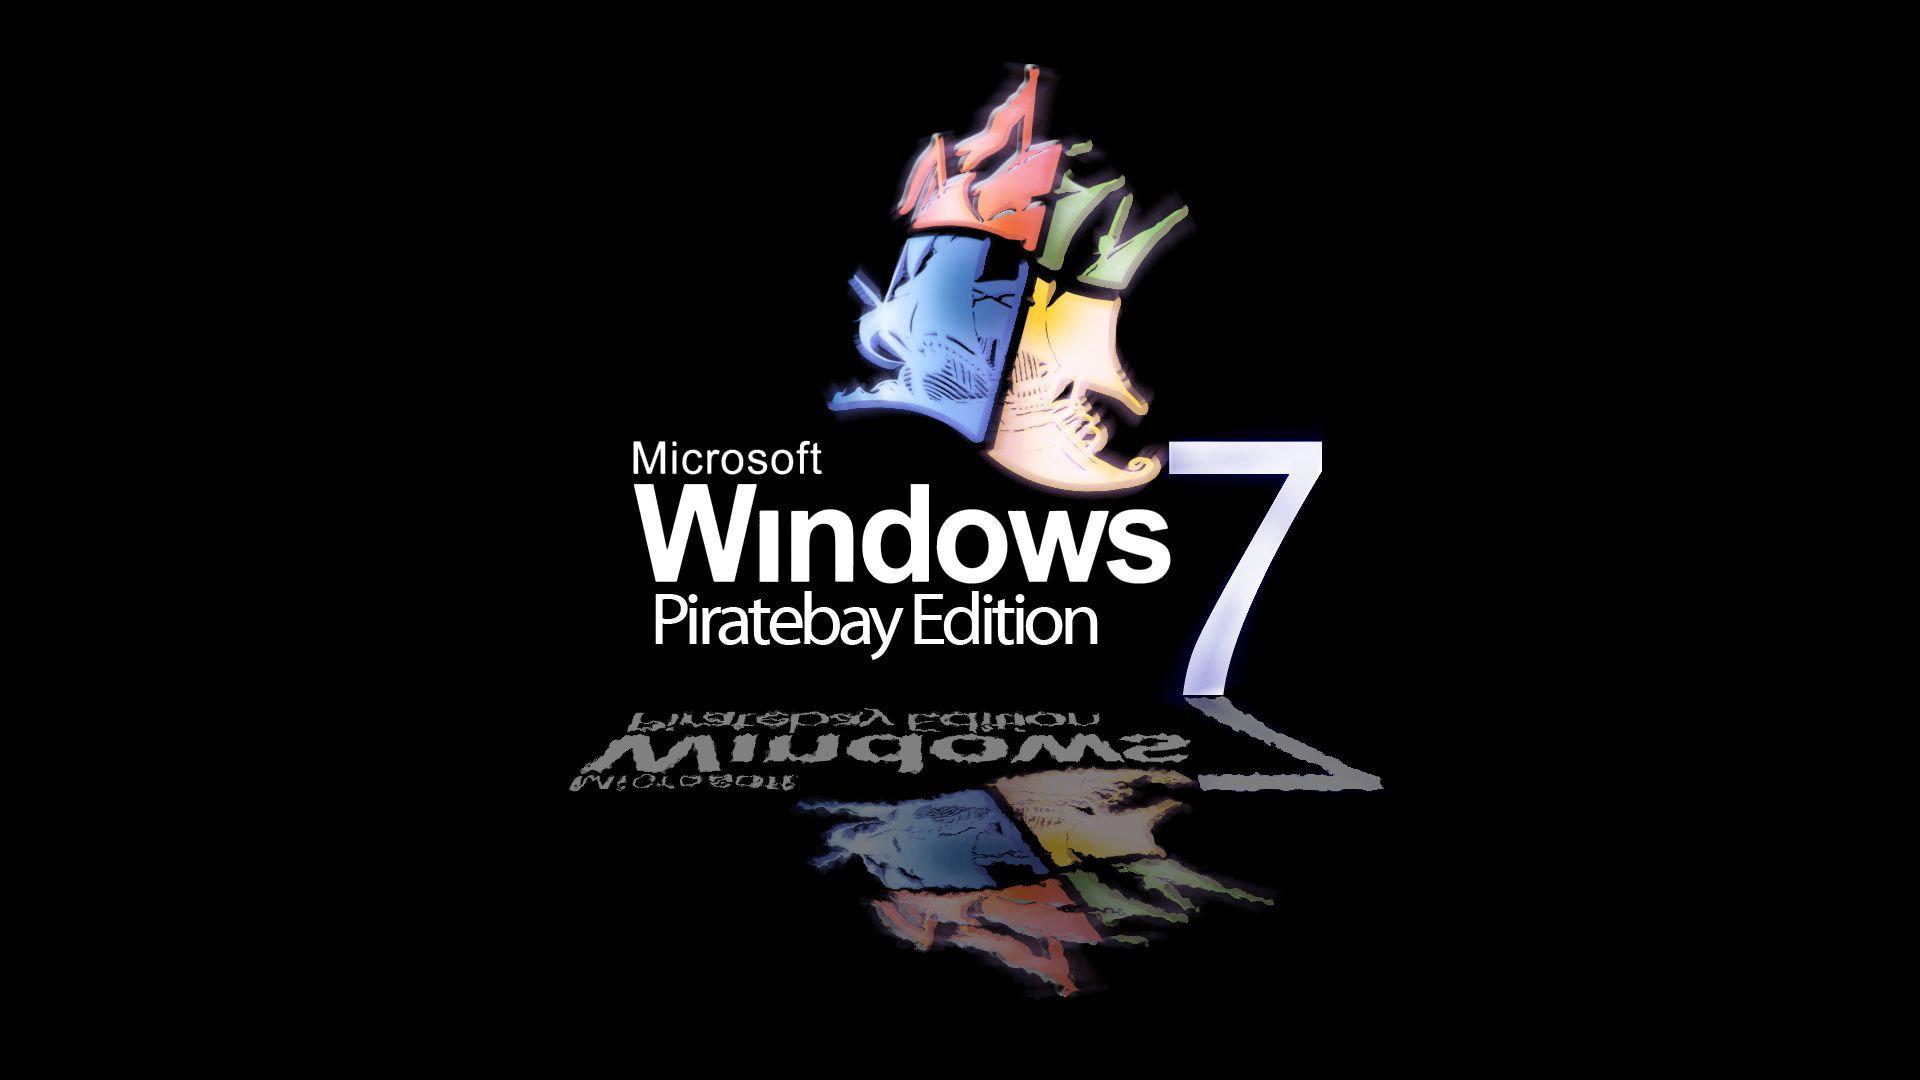 windows 7 wallpapers 1920x1080 full hd (1080p) desktop backgrounds